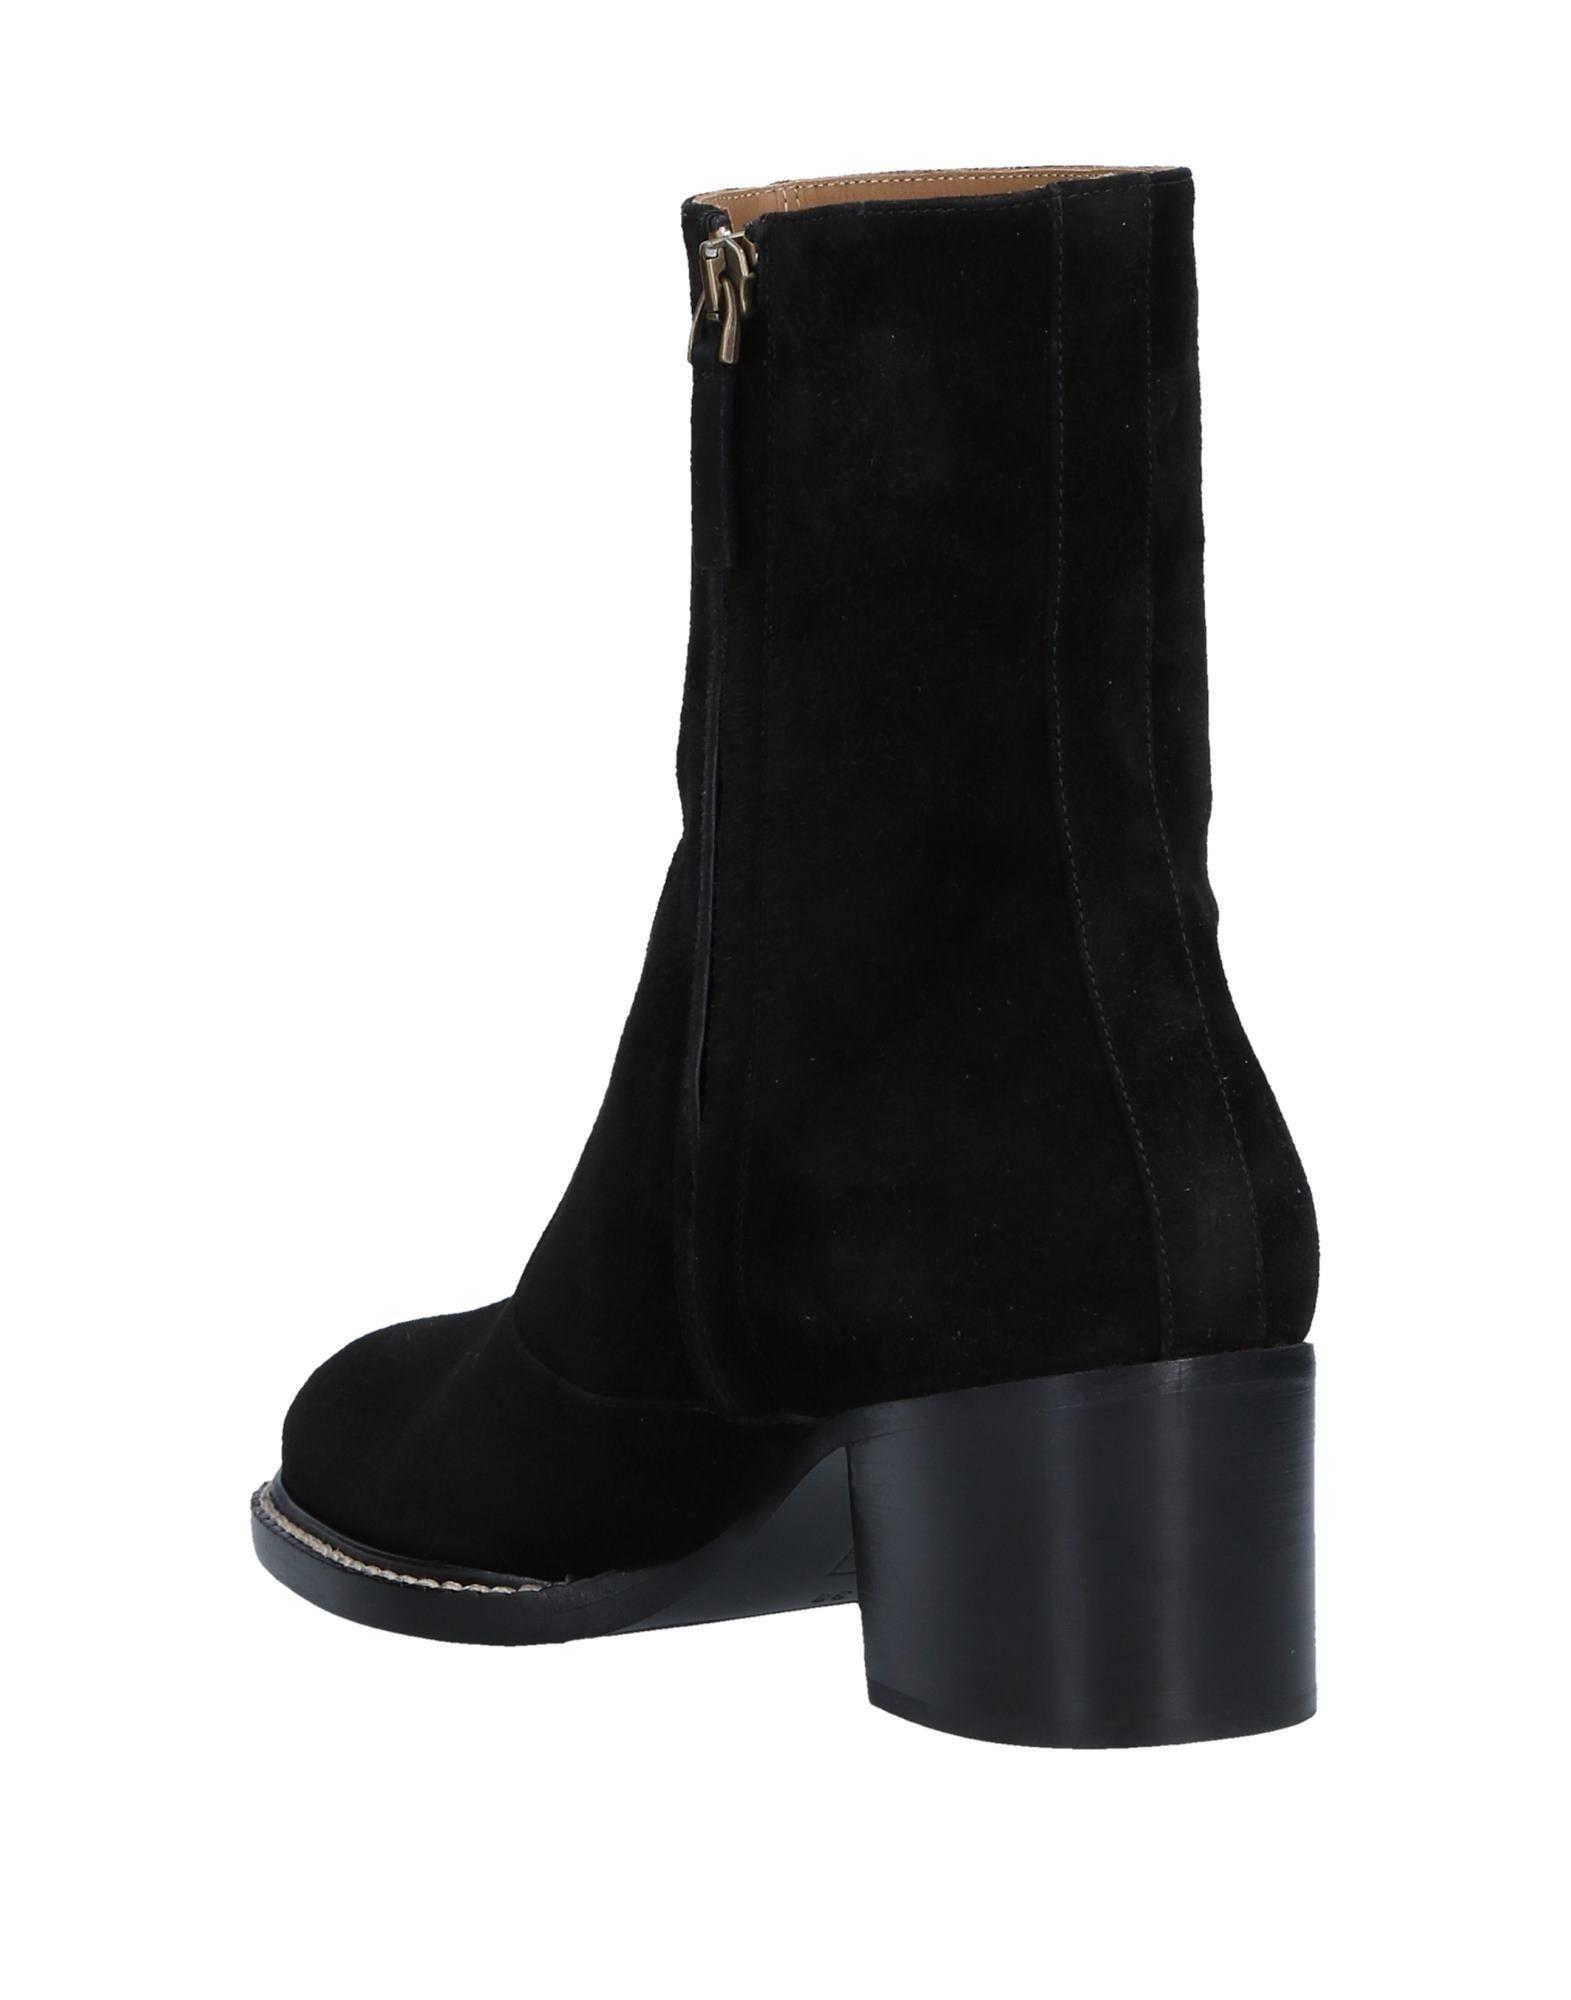 Rabatt Schuhe Veronique Branquinho Stiefelette 11544074TF Damen  11544074TF Stiefelette f6ae8e